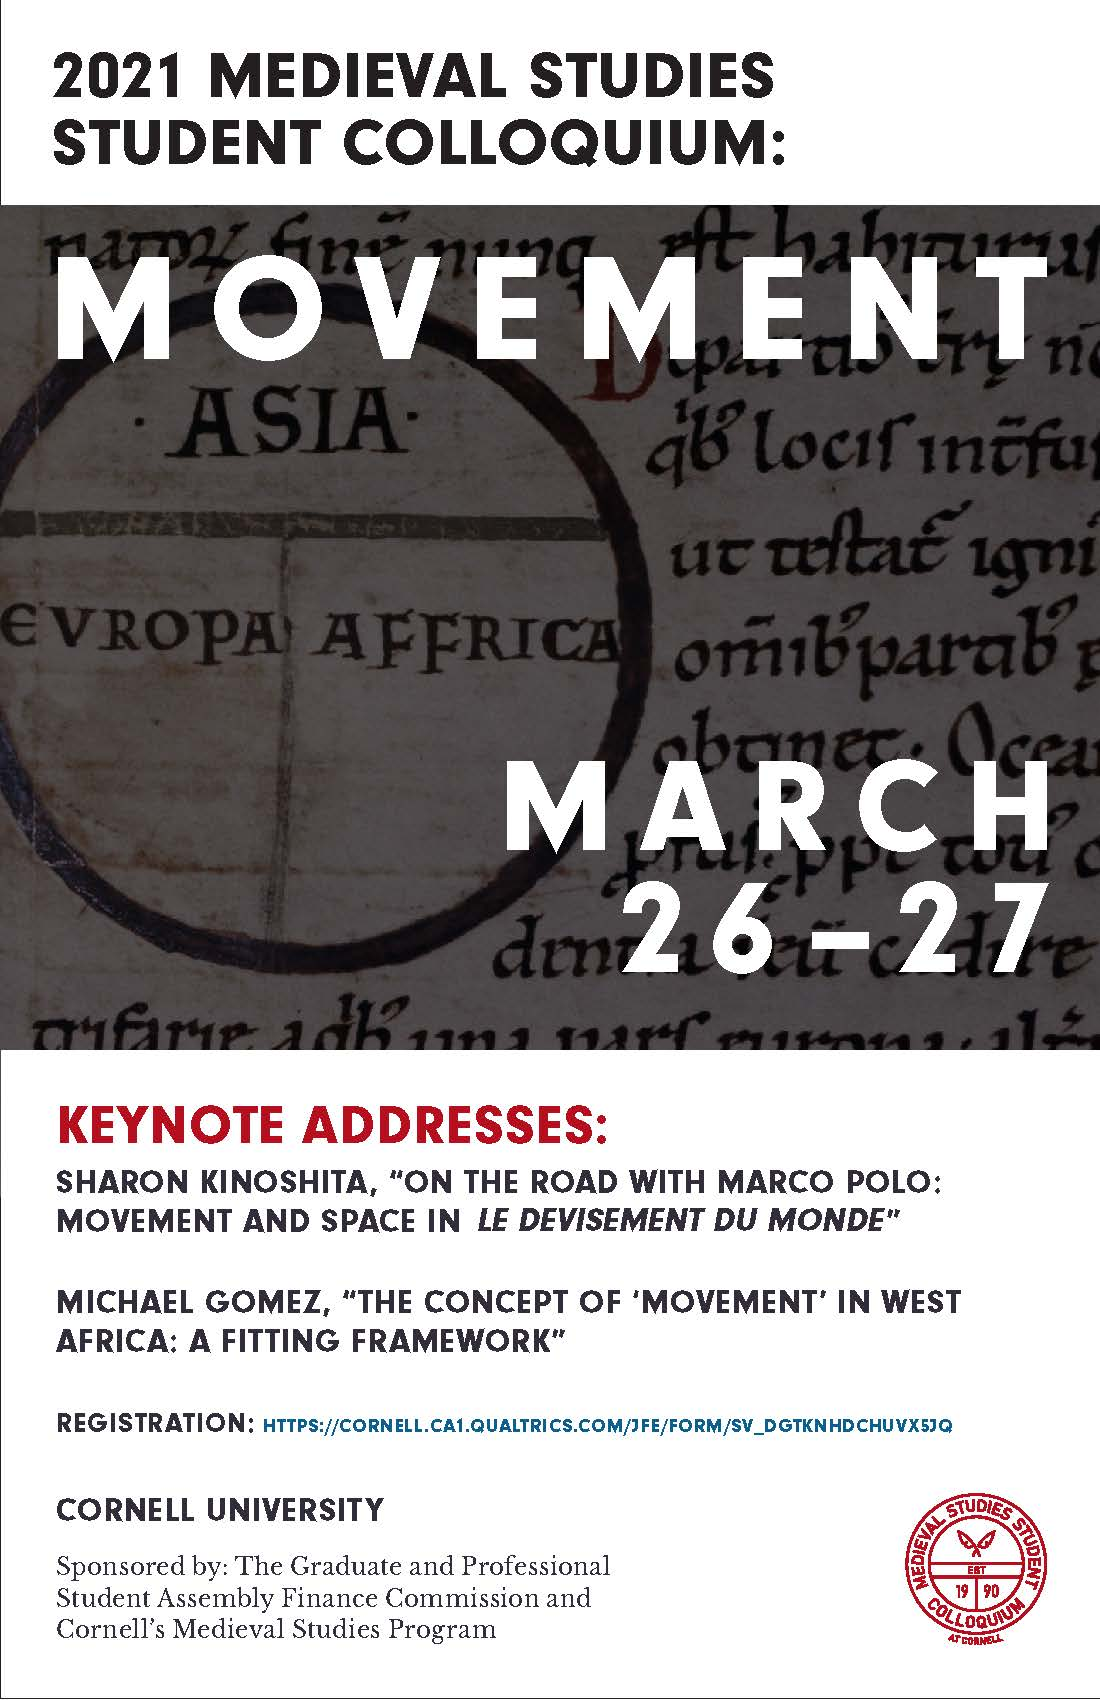 2021 MSSC: Movement